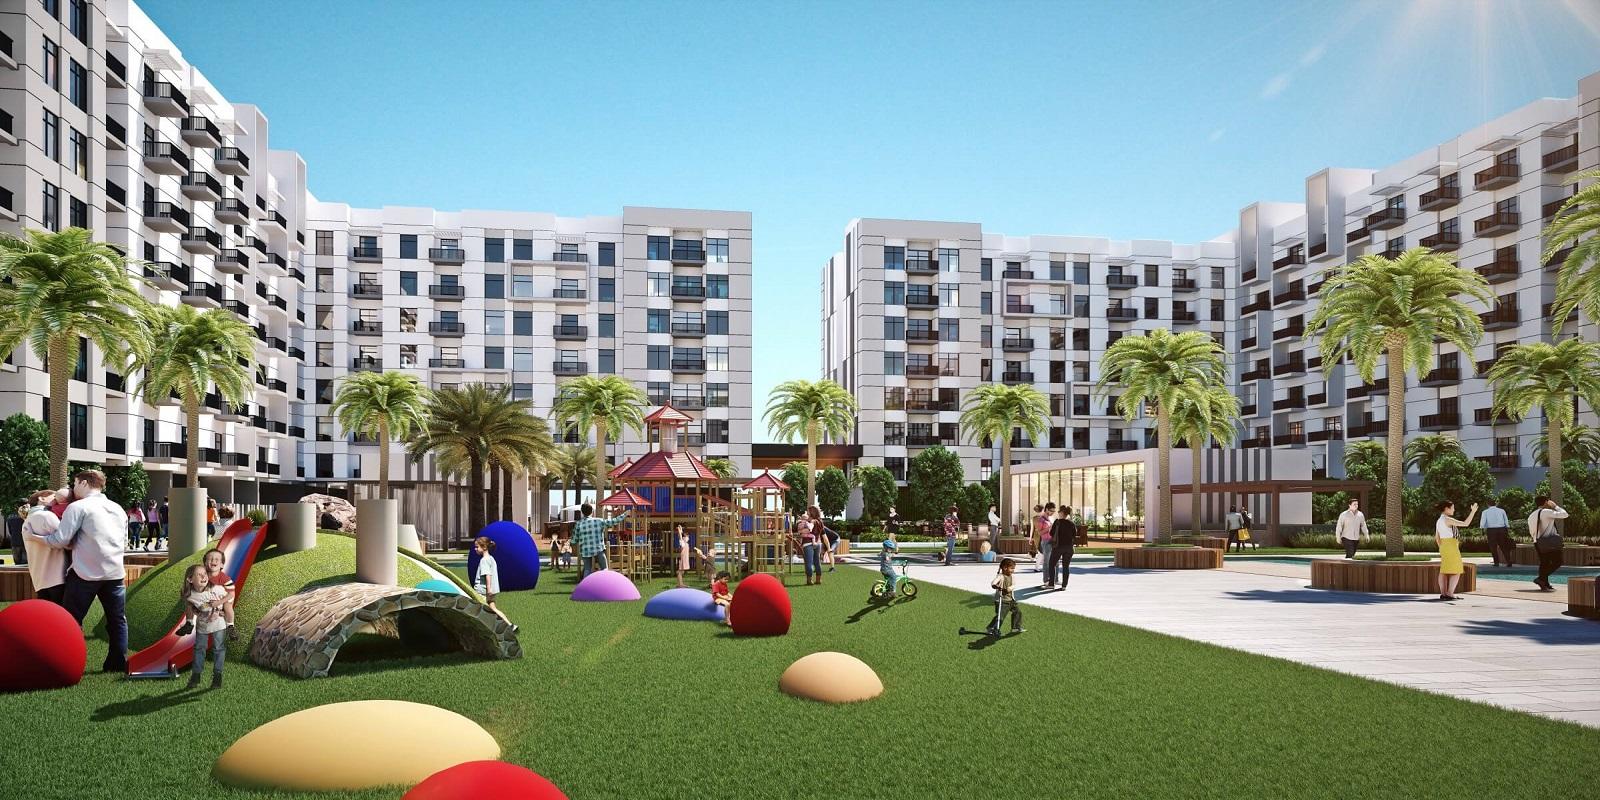 danube lawnz amenities features8